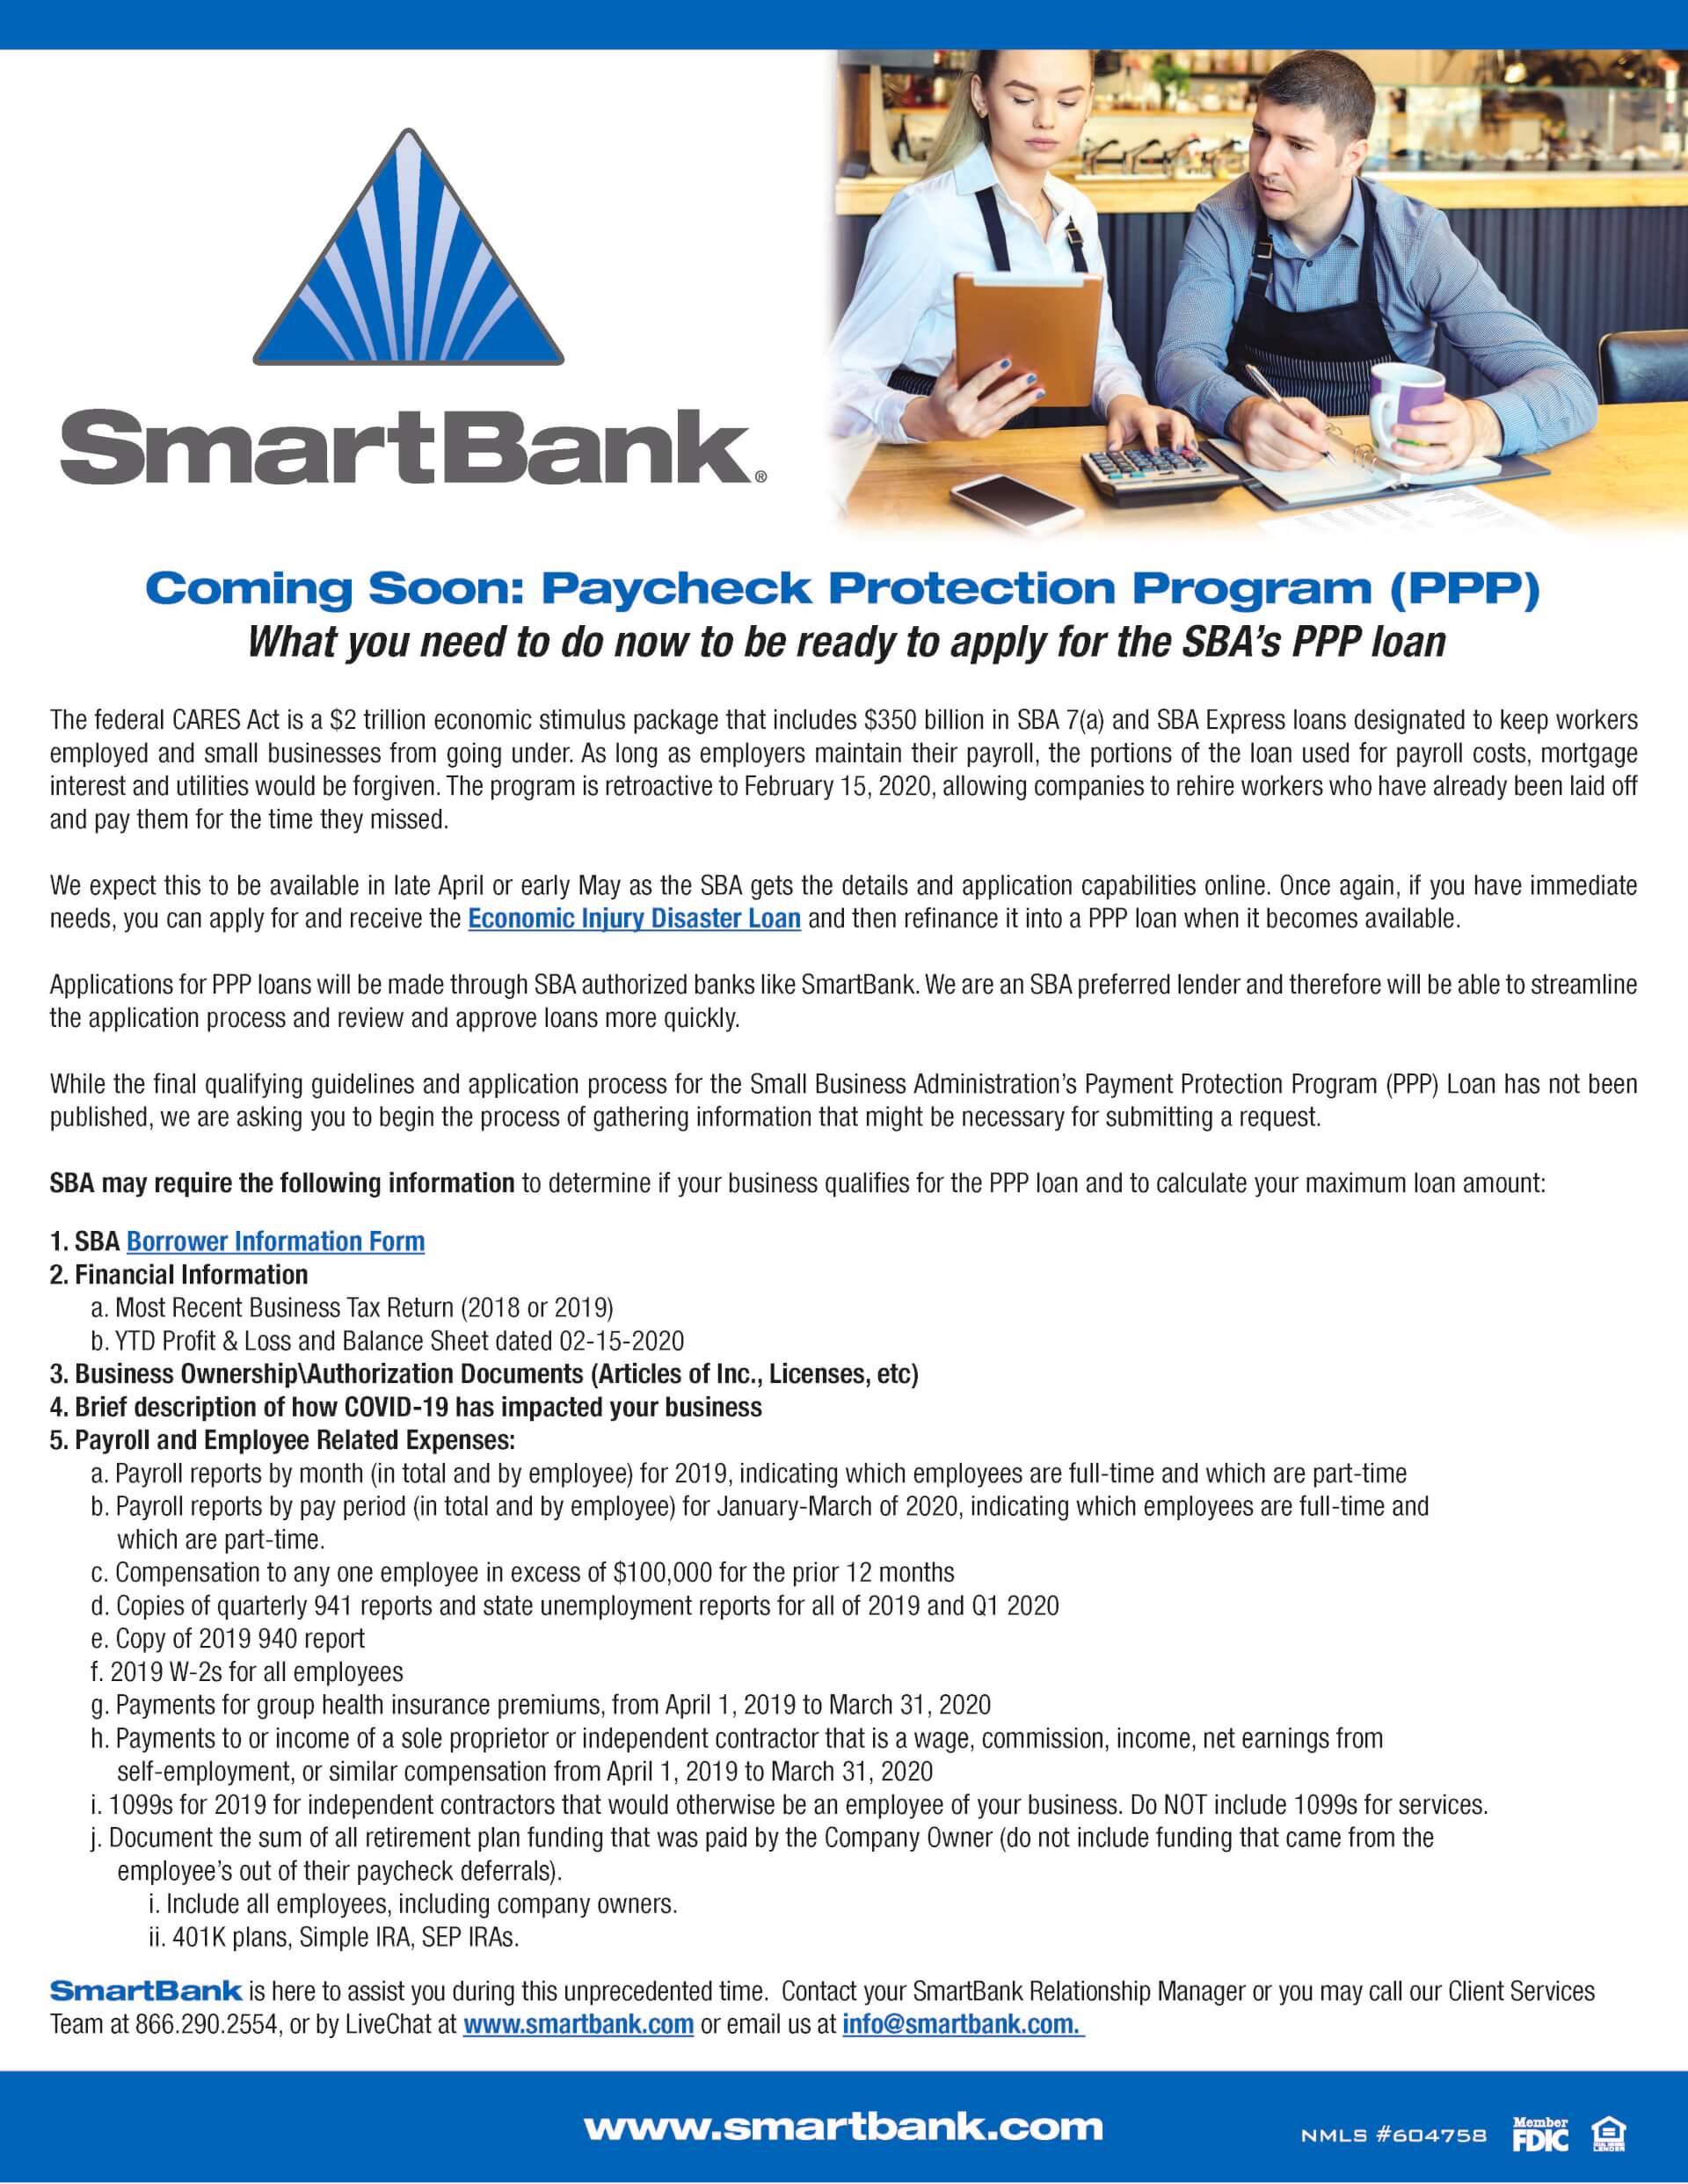 paycheckprotectionpgrm flyerfinal